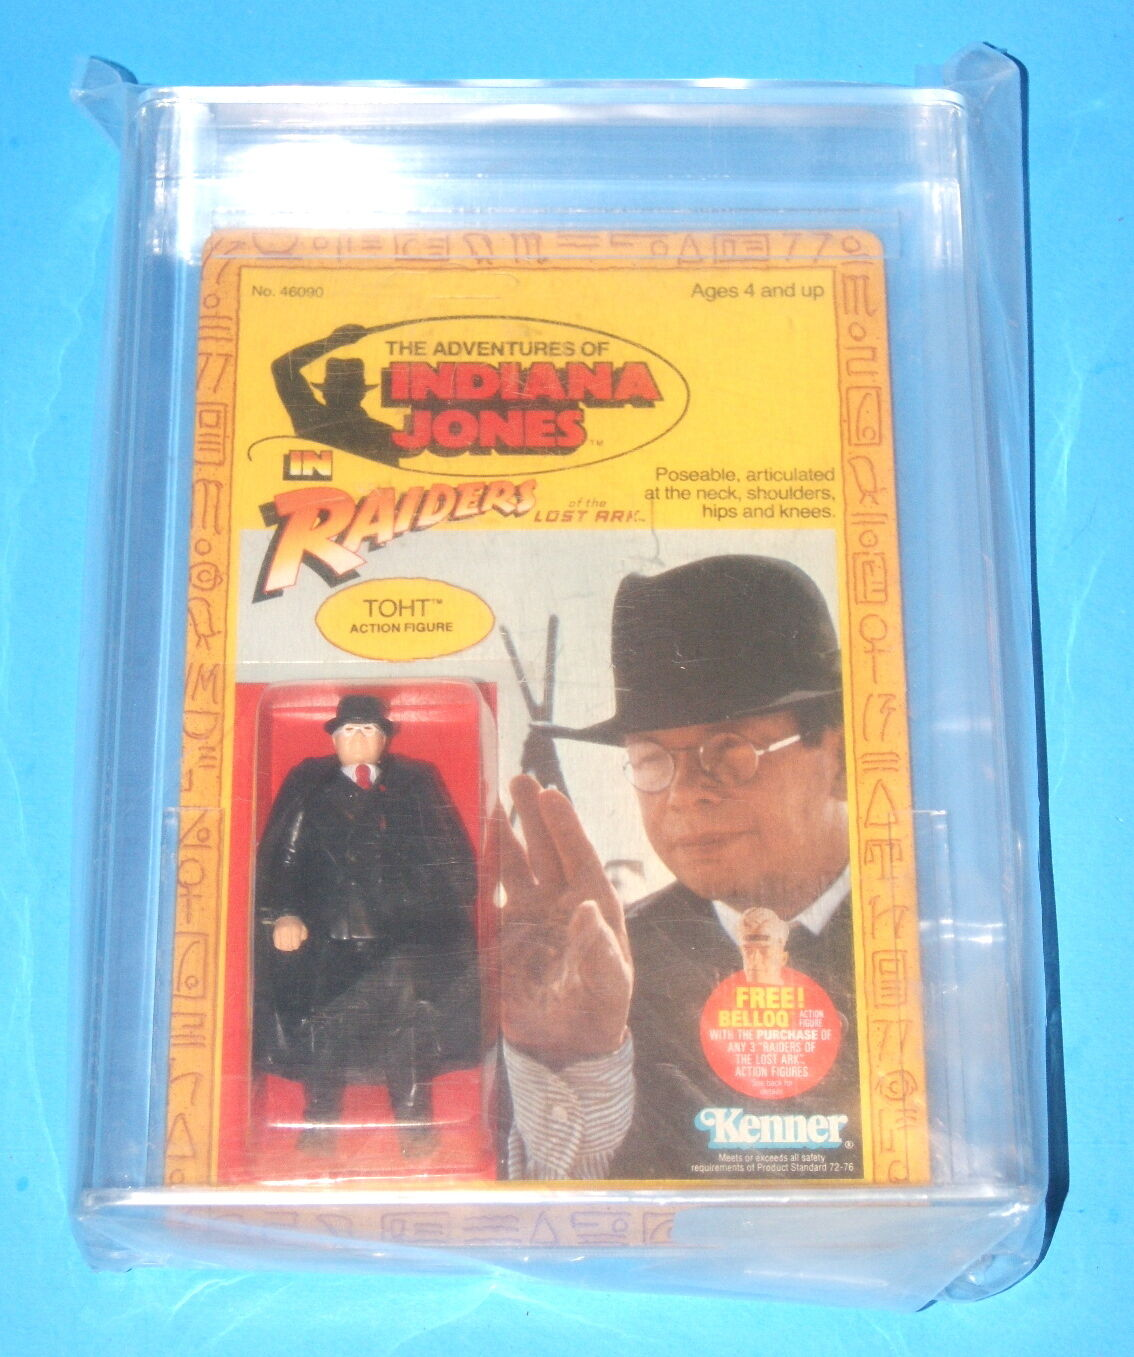 Indiana Jones Kenner rojola Toht Afa 85 Inverdeiti P.O.P.Trasparente Bolla